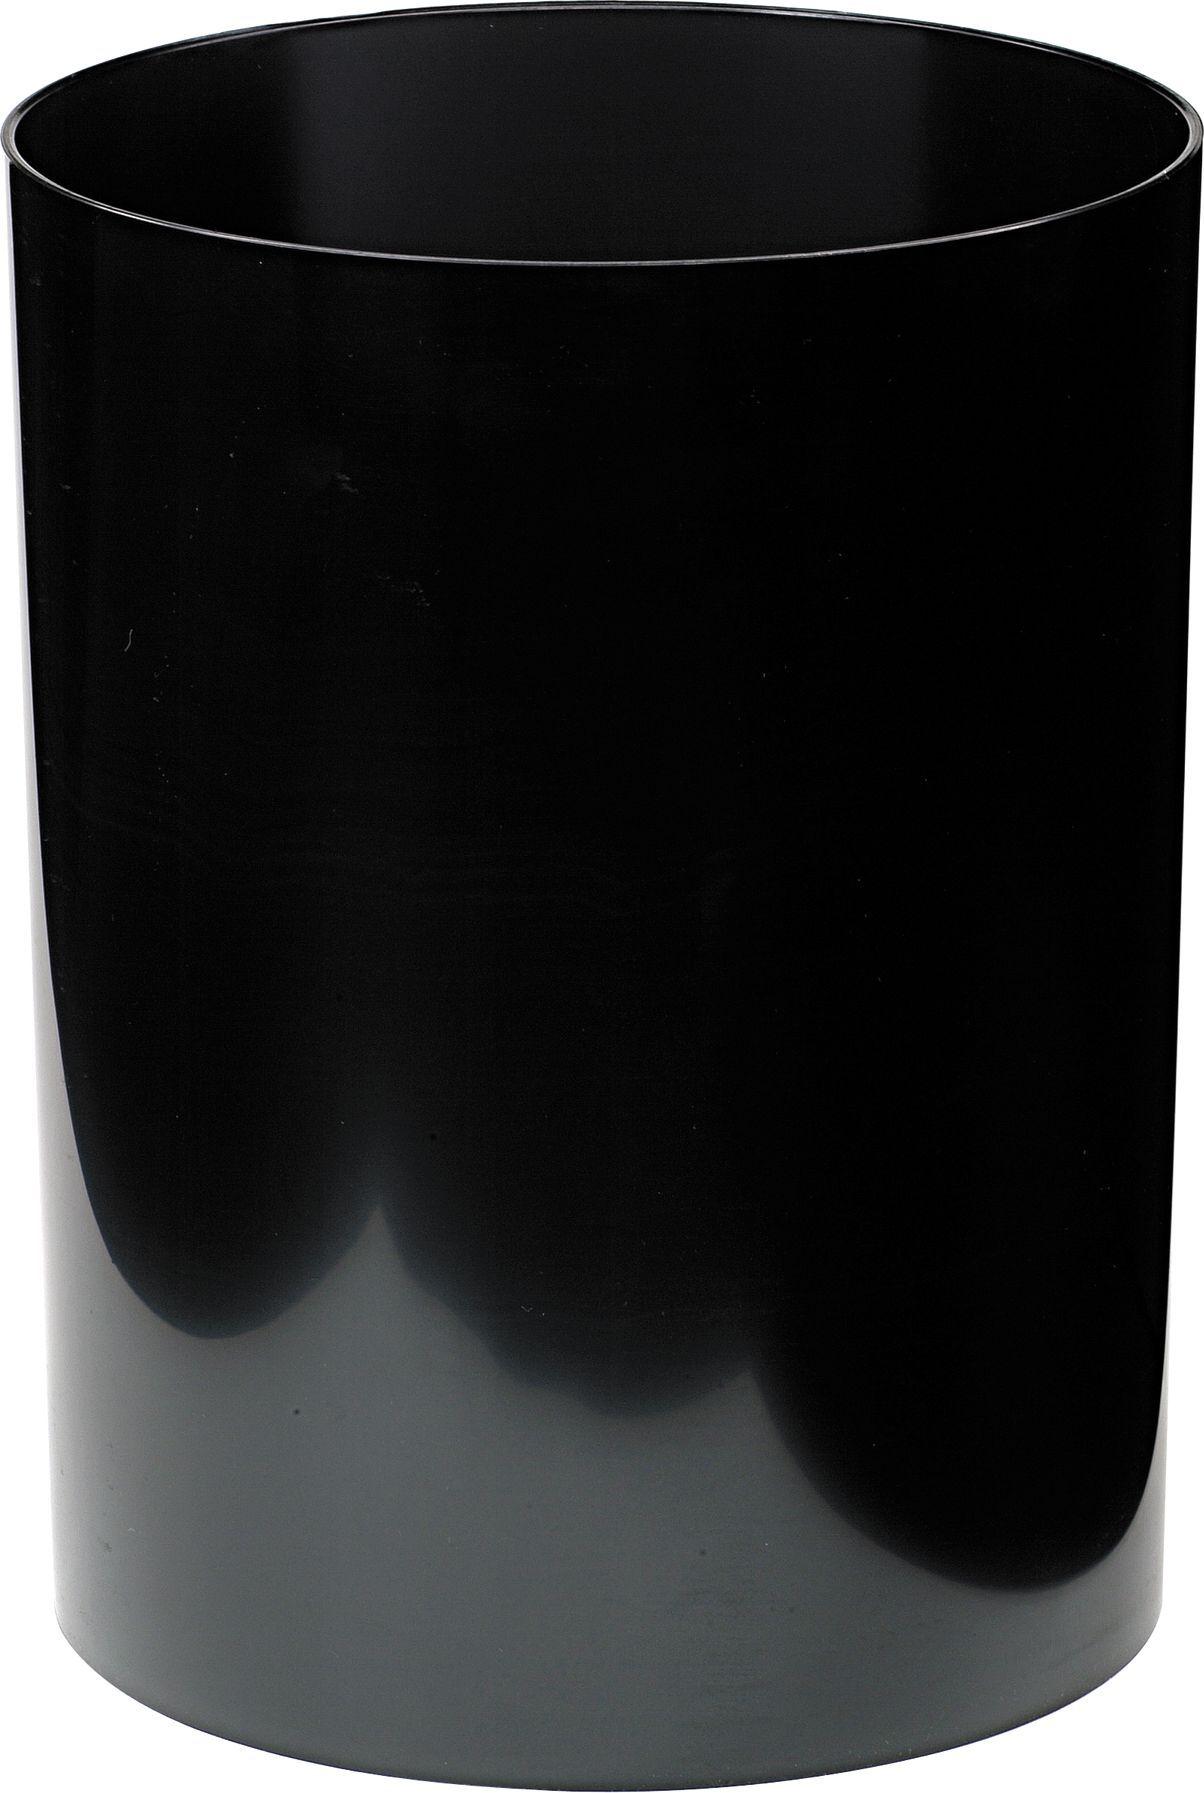 CEP Papirkurv Ice Black 16L 2105501